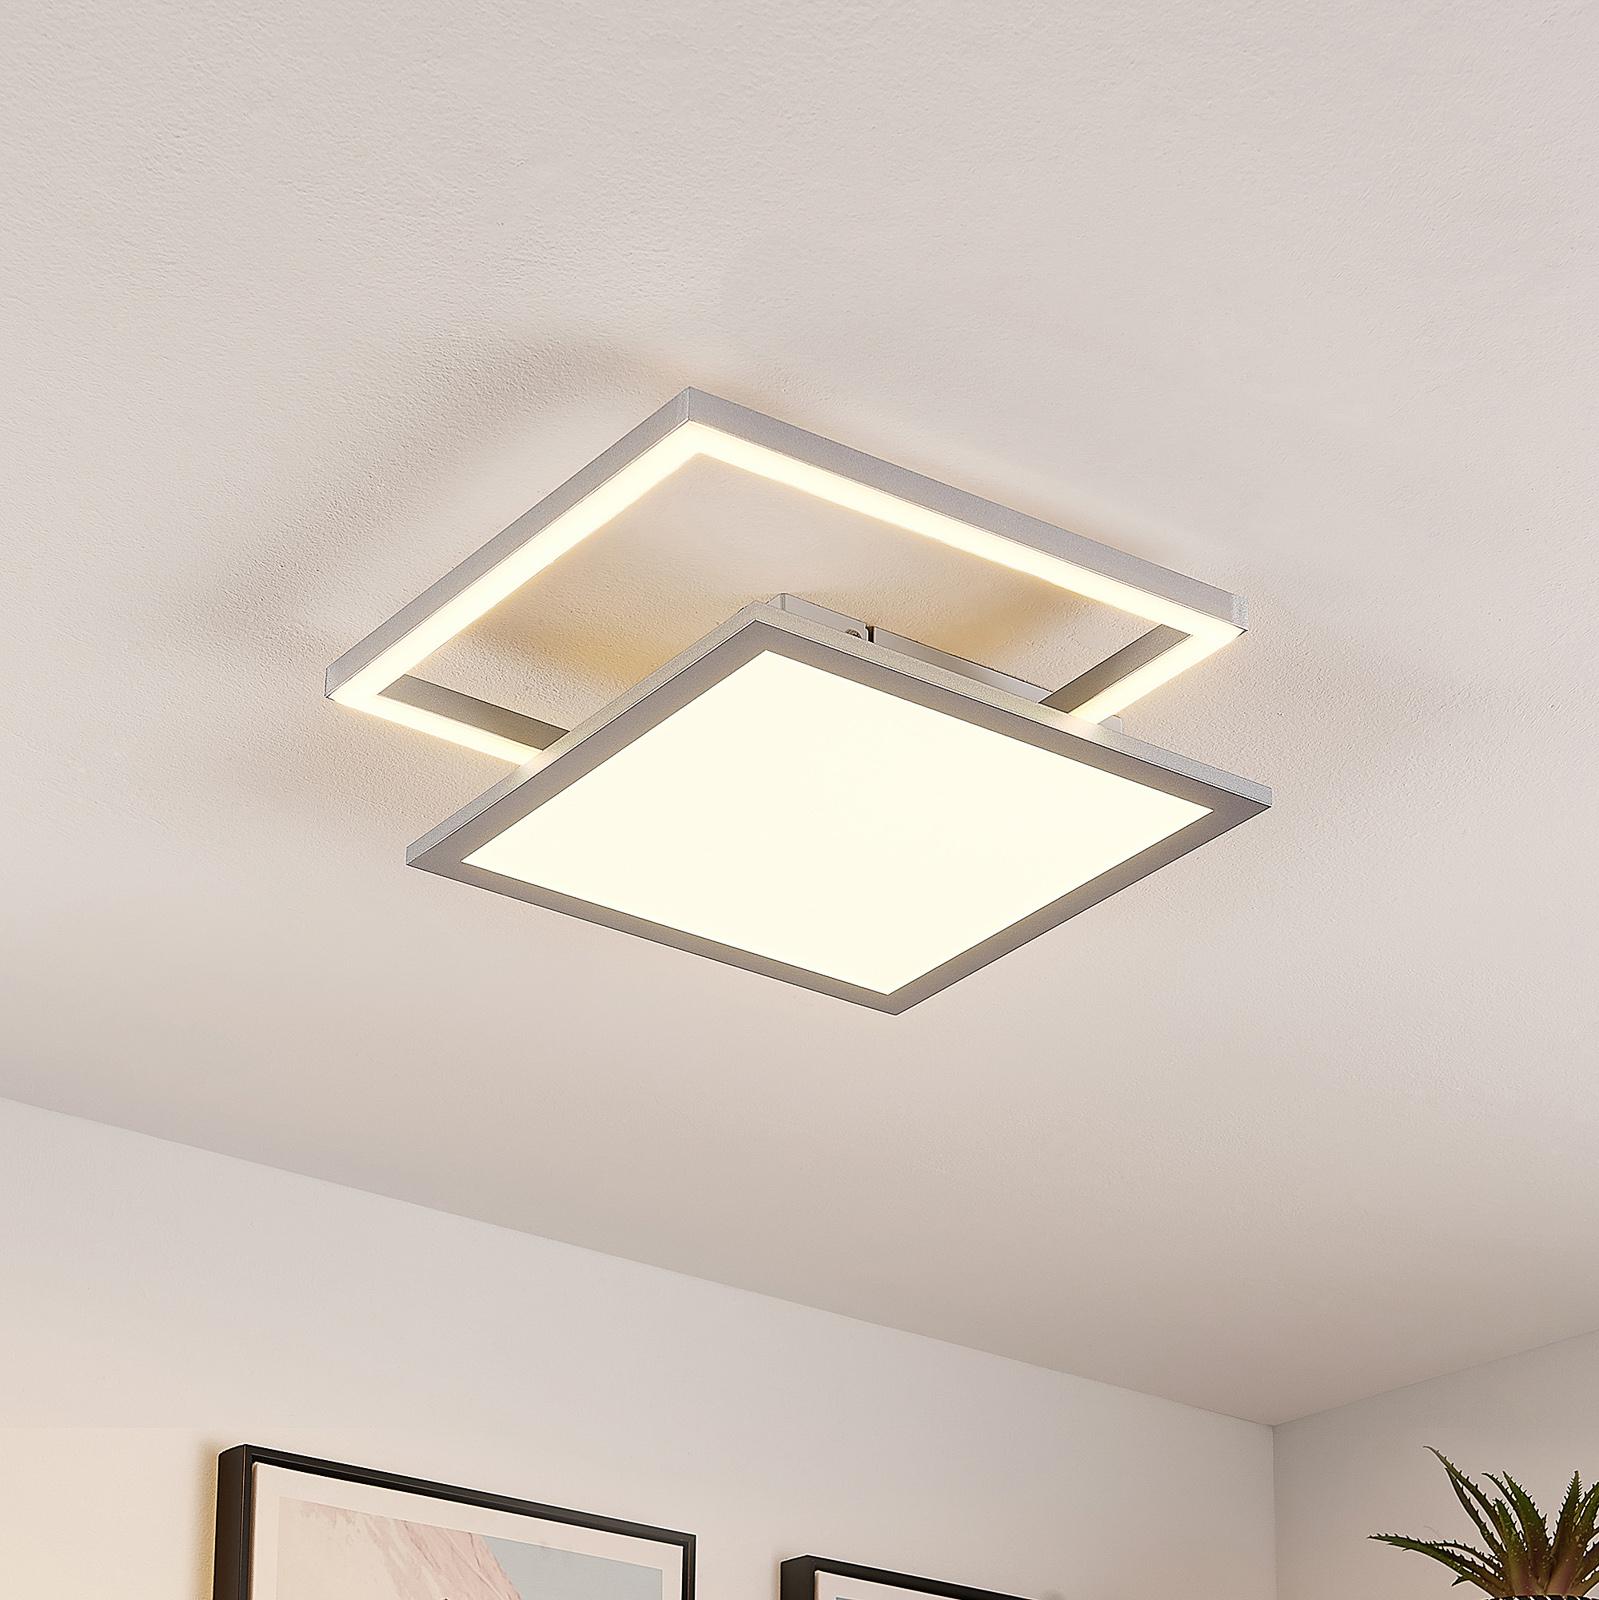 Lucande Senan LED-Deckenlampe, quadratisch